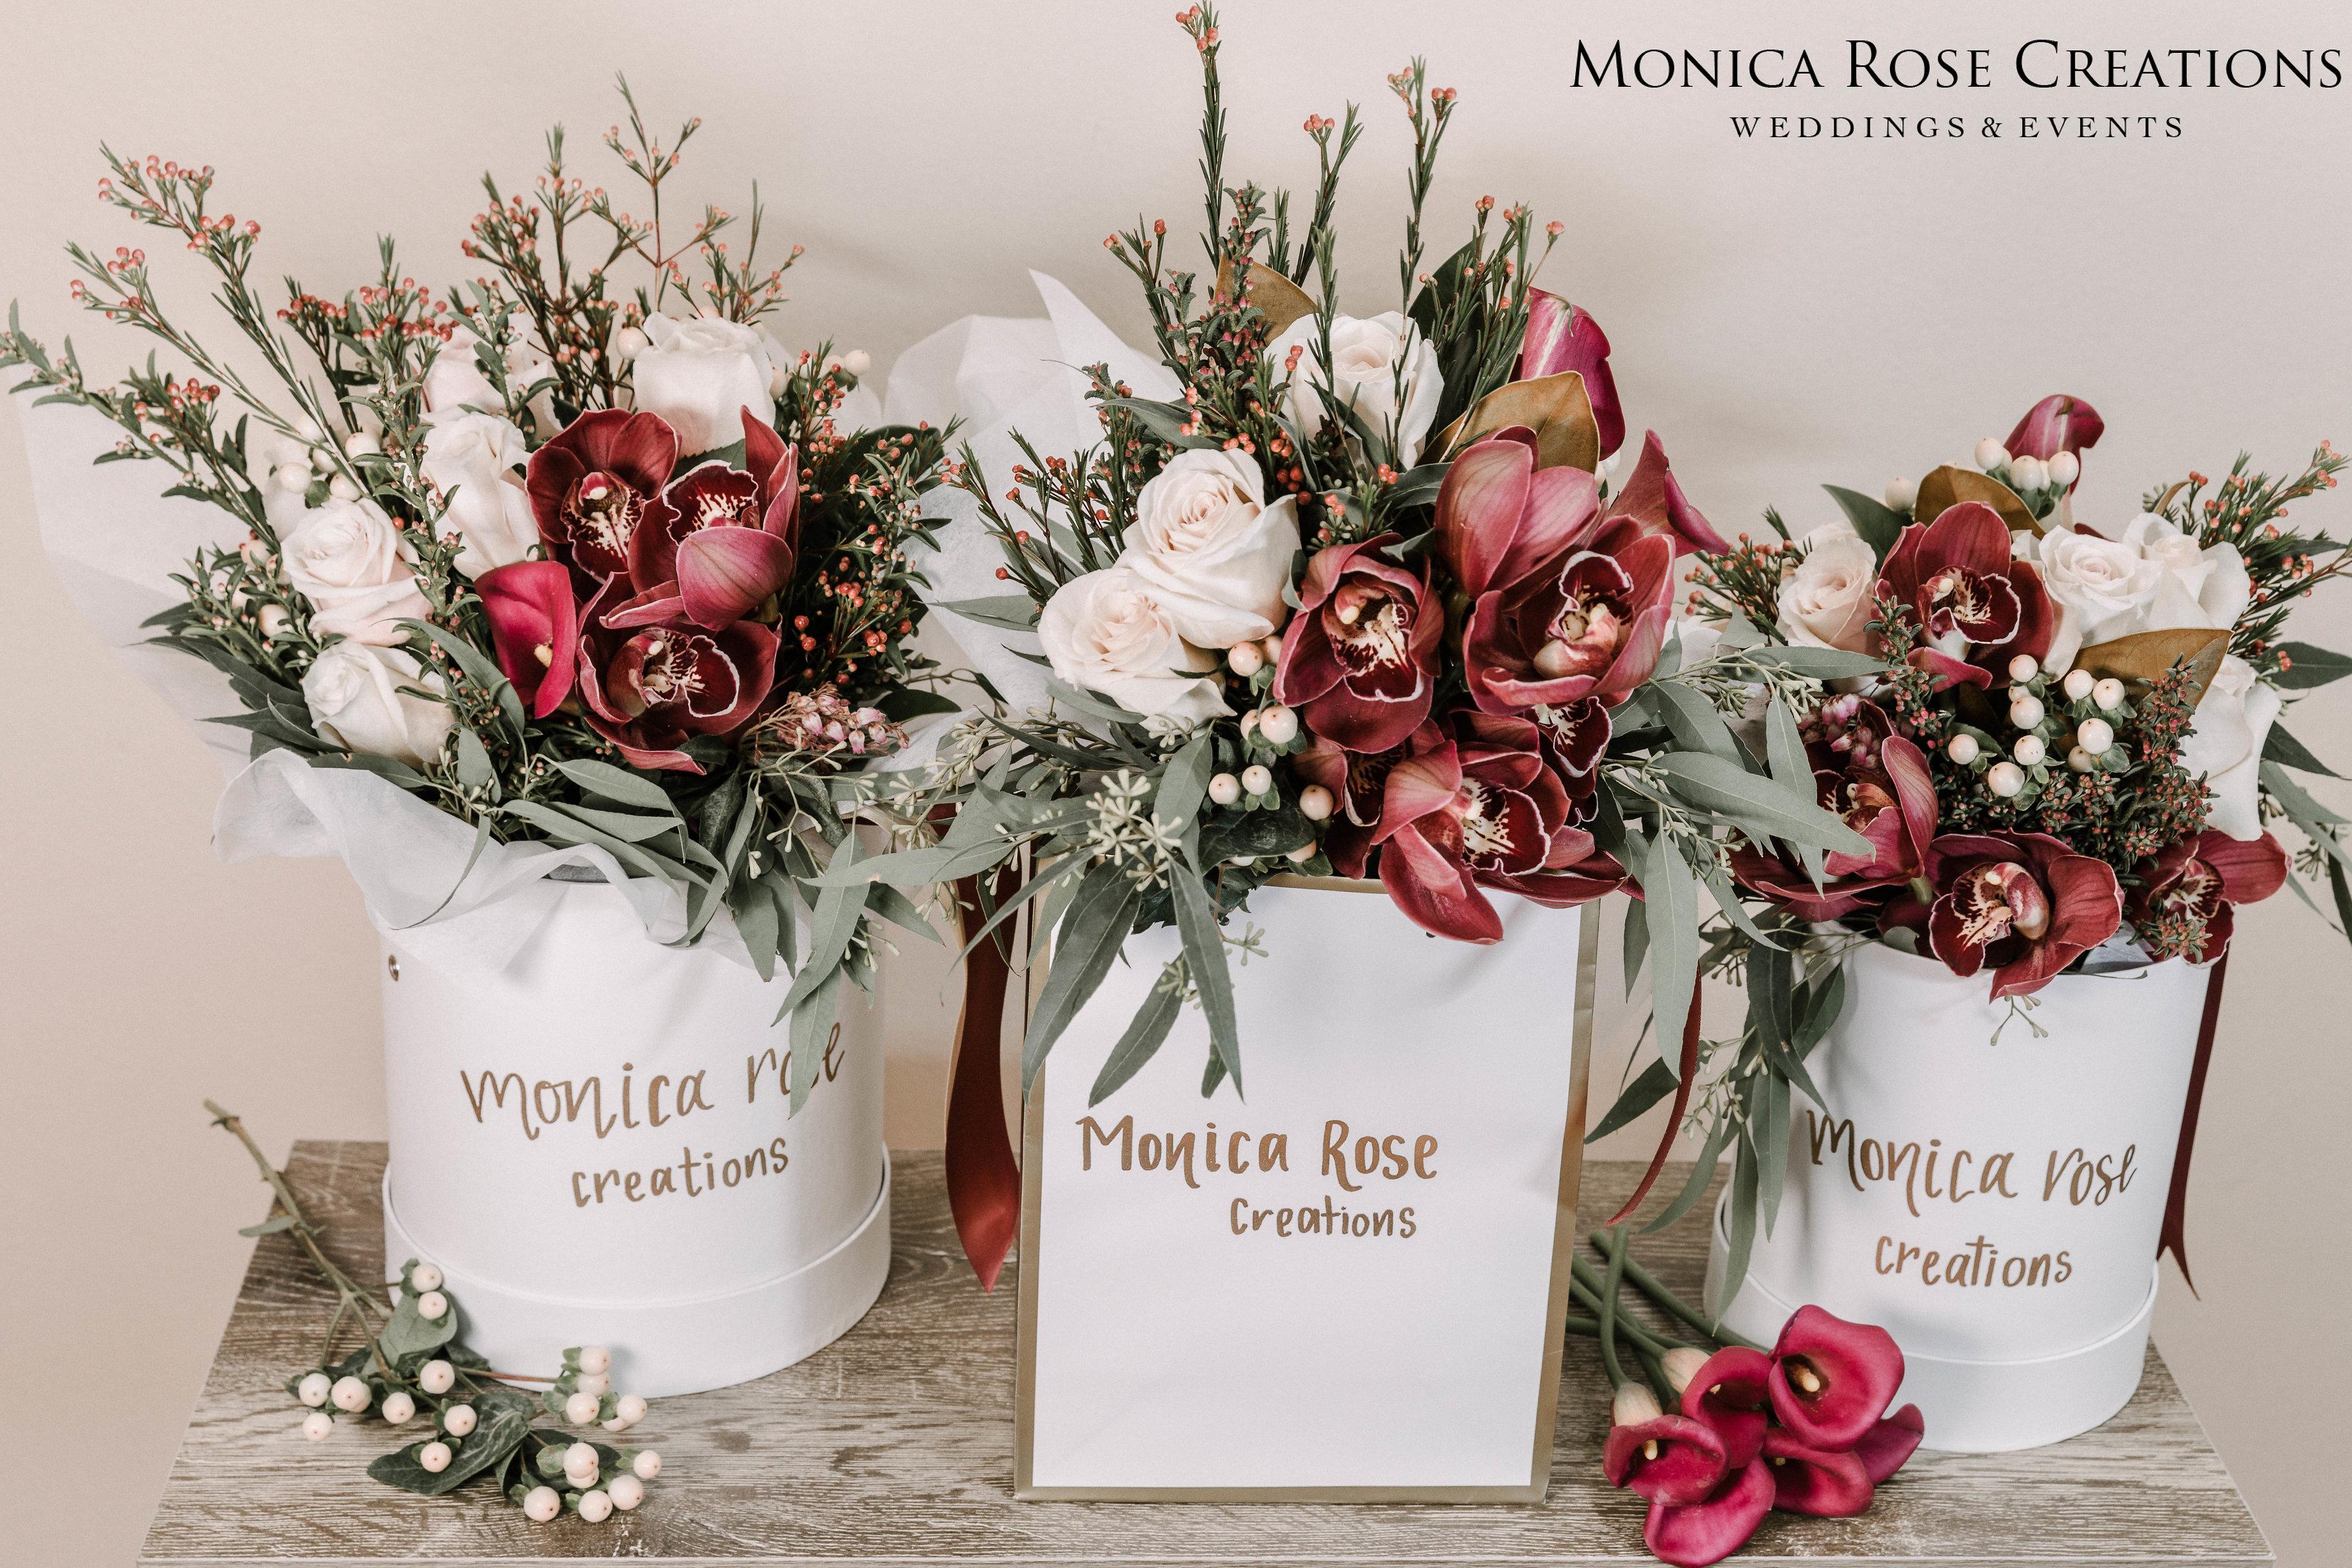 MonicaRoseP001_20180808__5D40706 - Copy.